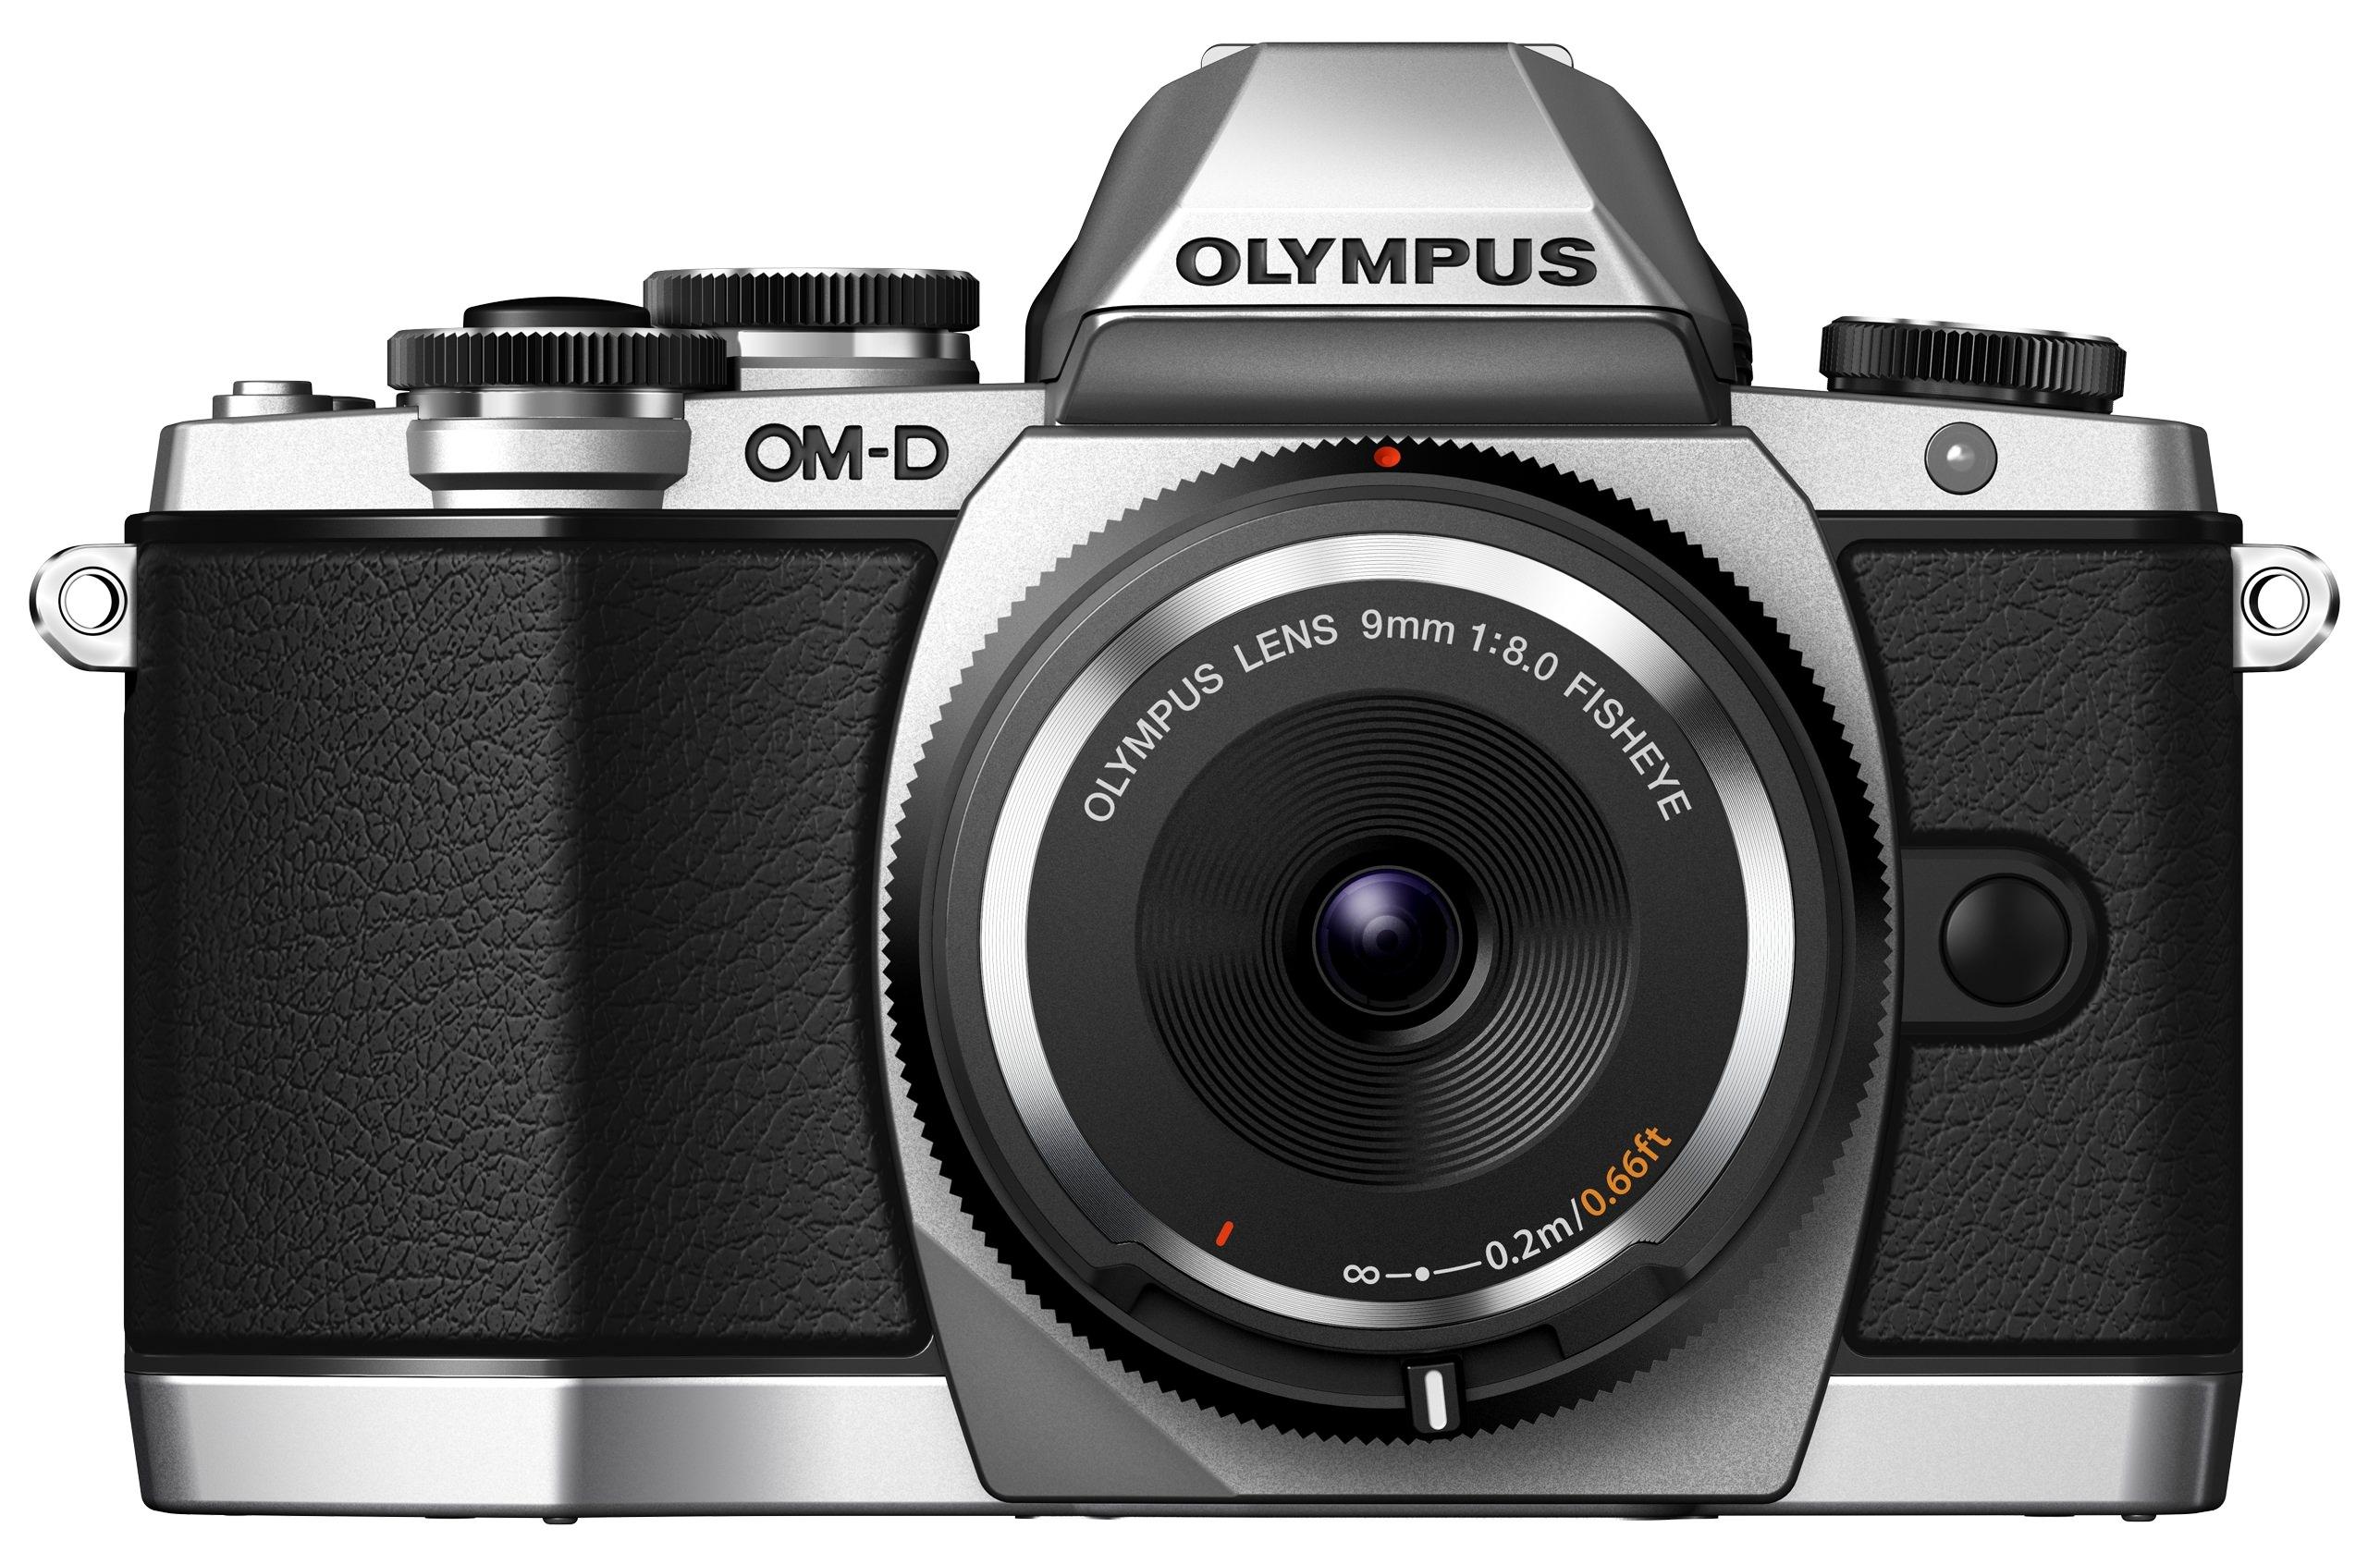 Olympus 25mm 14 42mm 9mm Fisheye Lens Announced